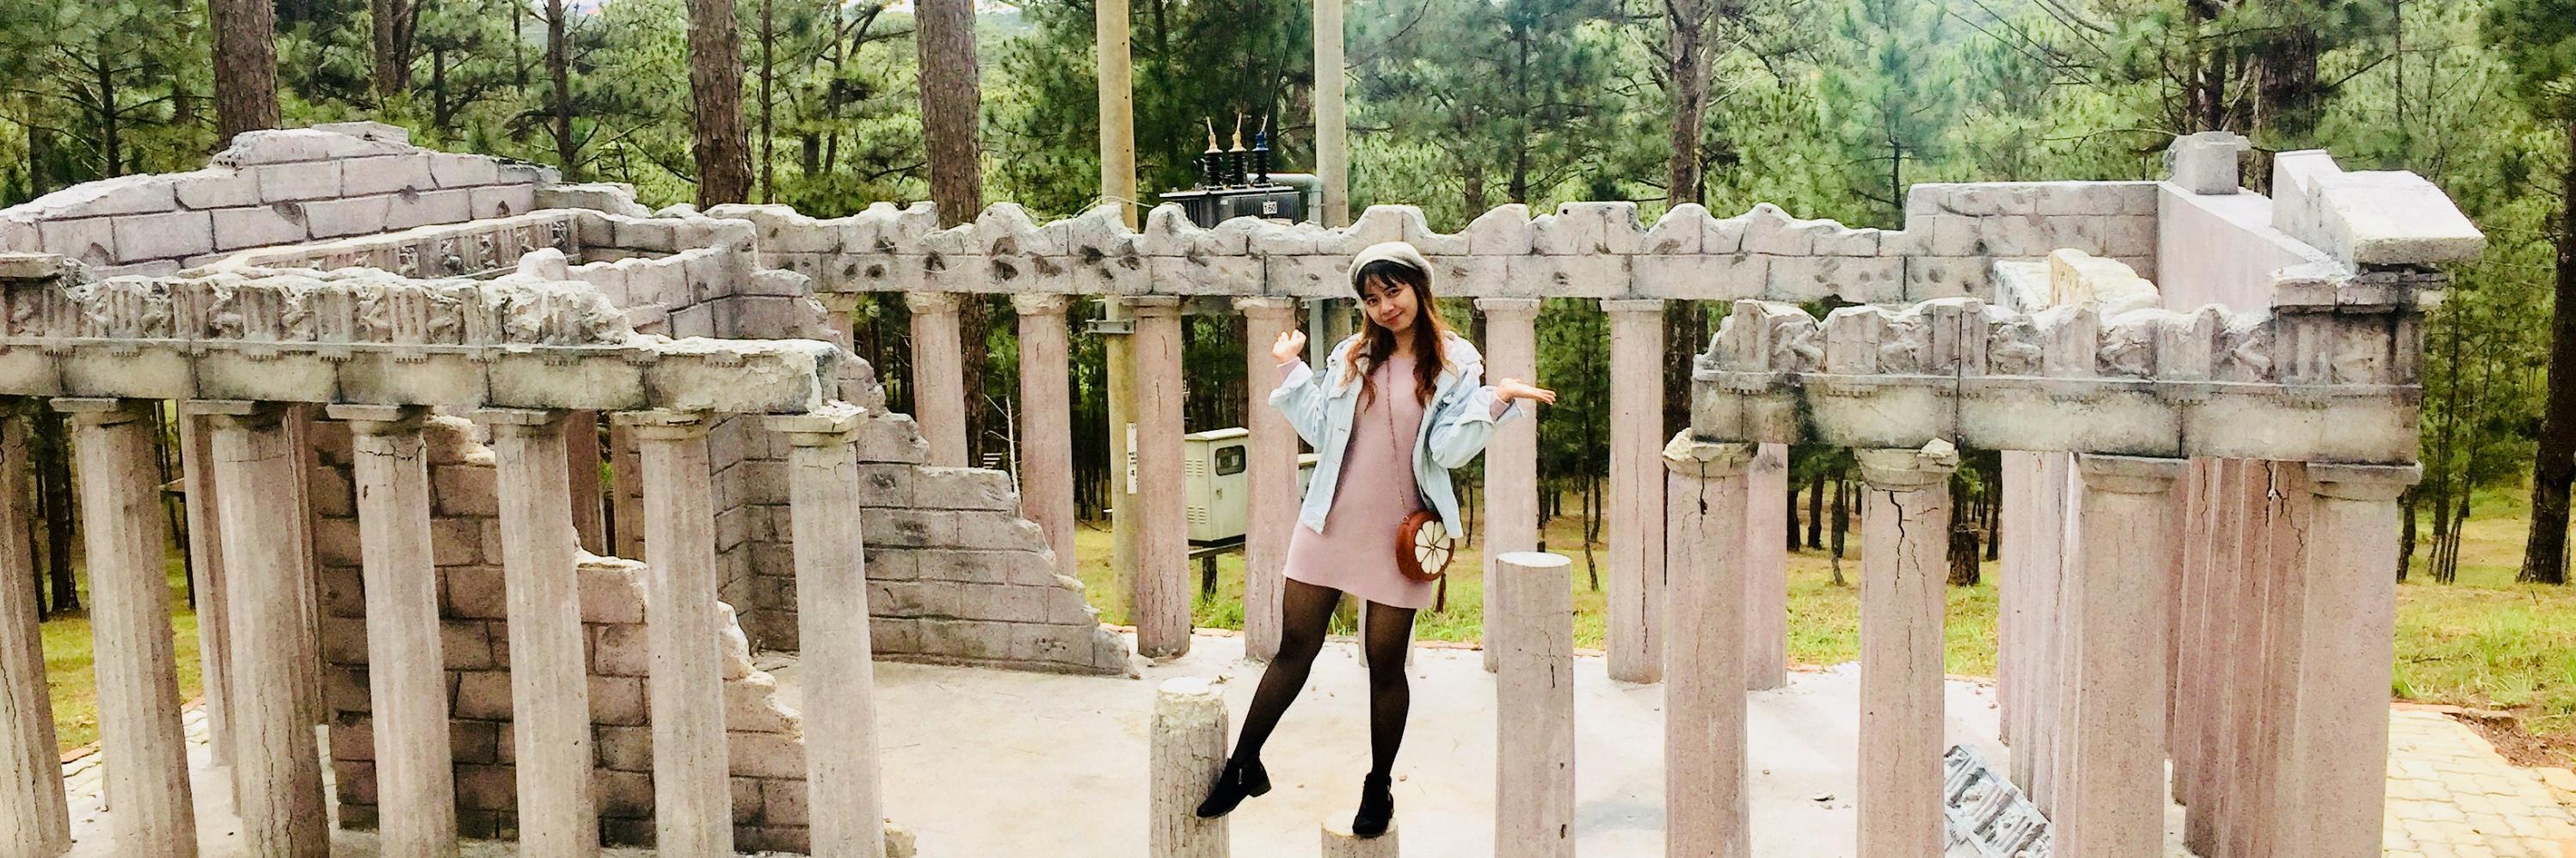 https://gody.vn/blog/olipnoi4502/post/thung-lung-tinh-yeu-thien-duong-cho-nhung-ke-mong-mo-7926